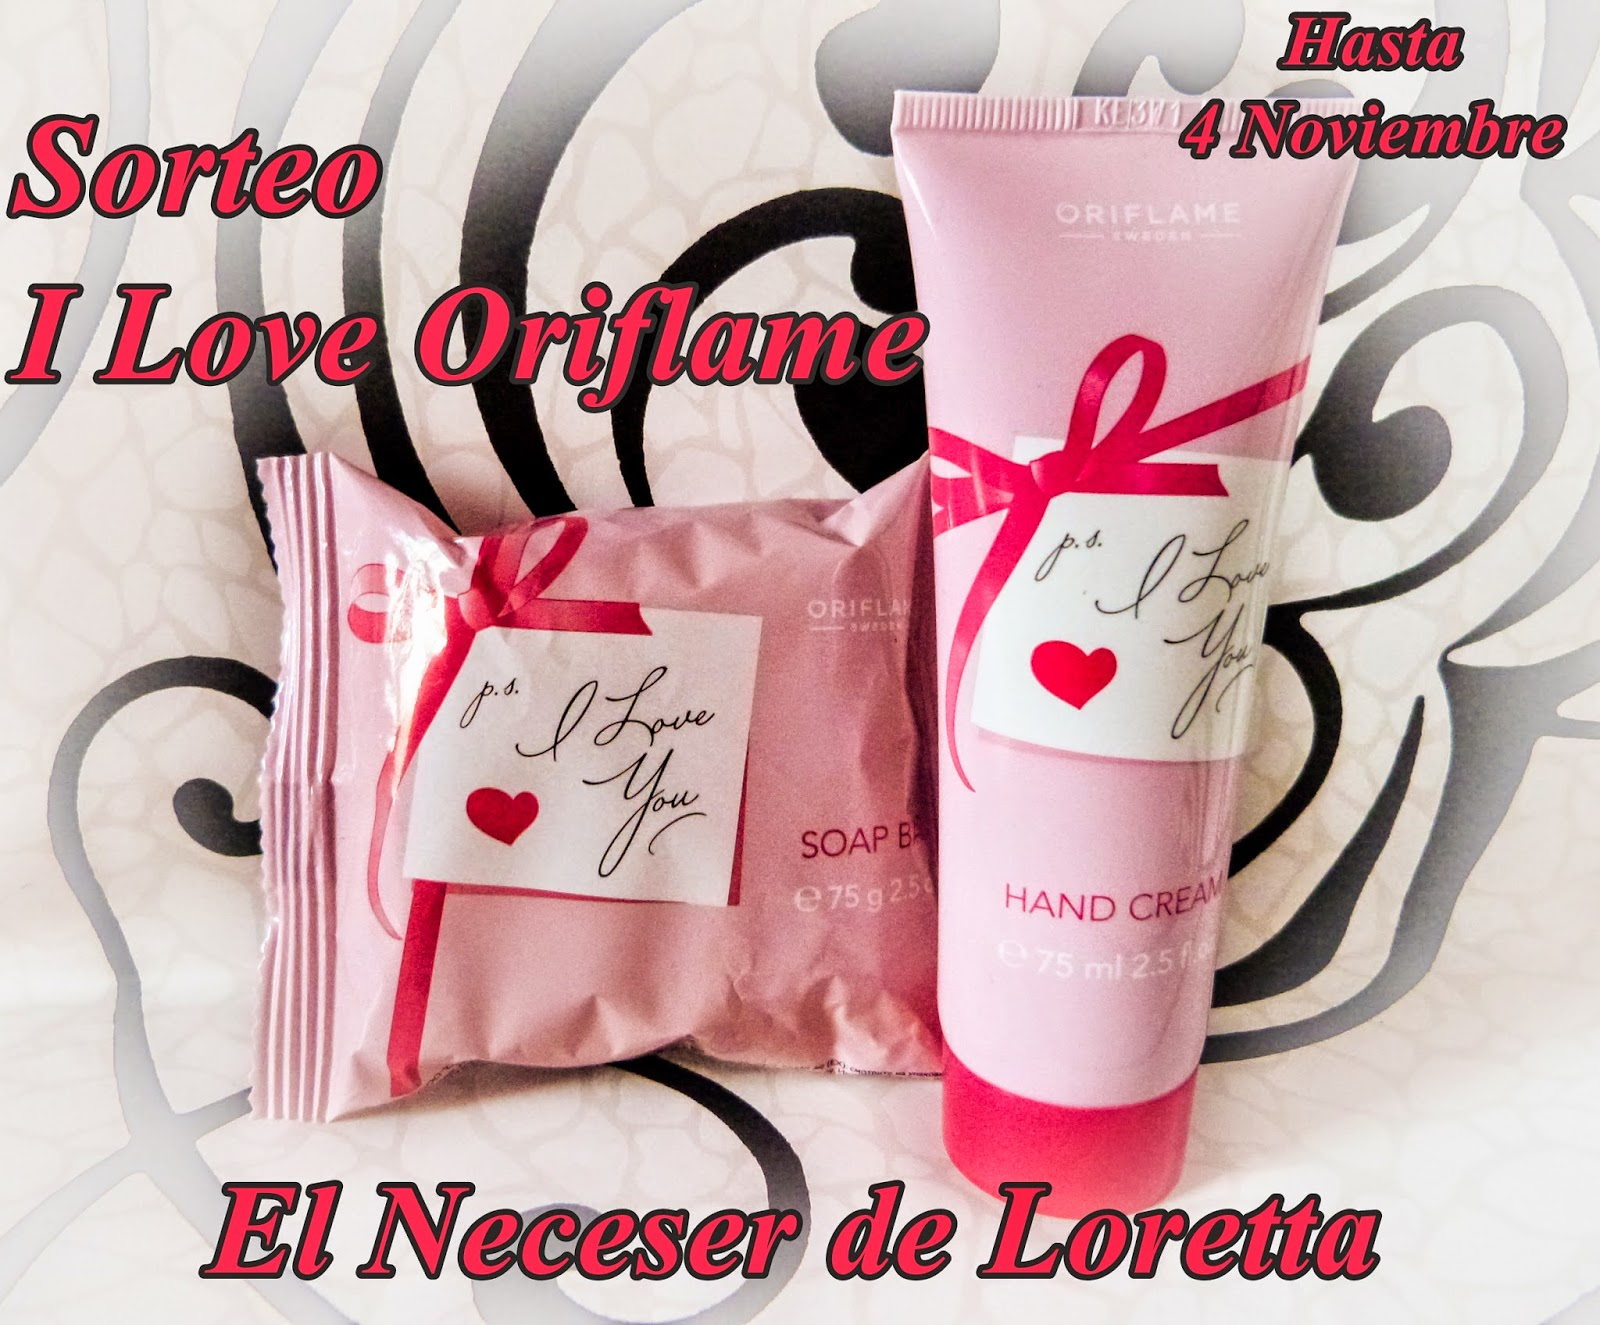 http://lorettaoriflamica.blogspot.com.es/2014/09/sorteo-i-love-oriflame.html